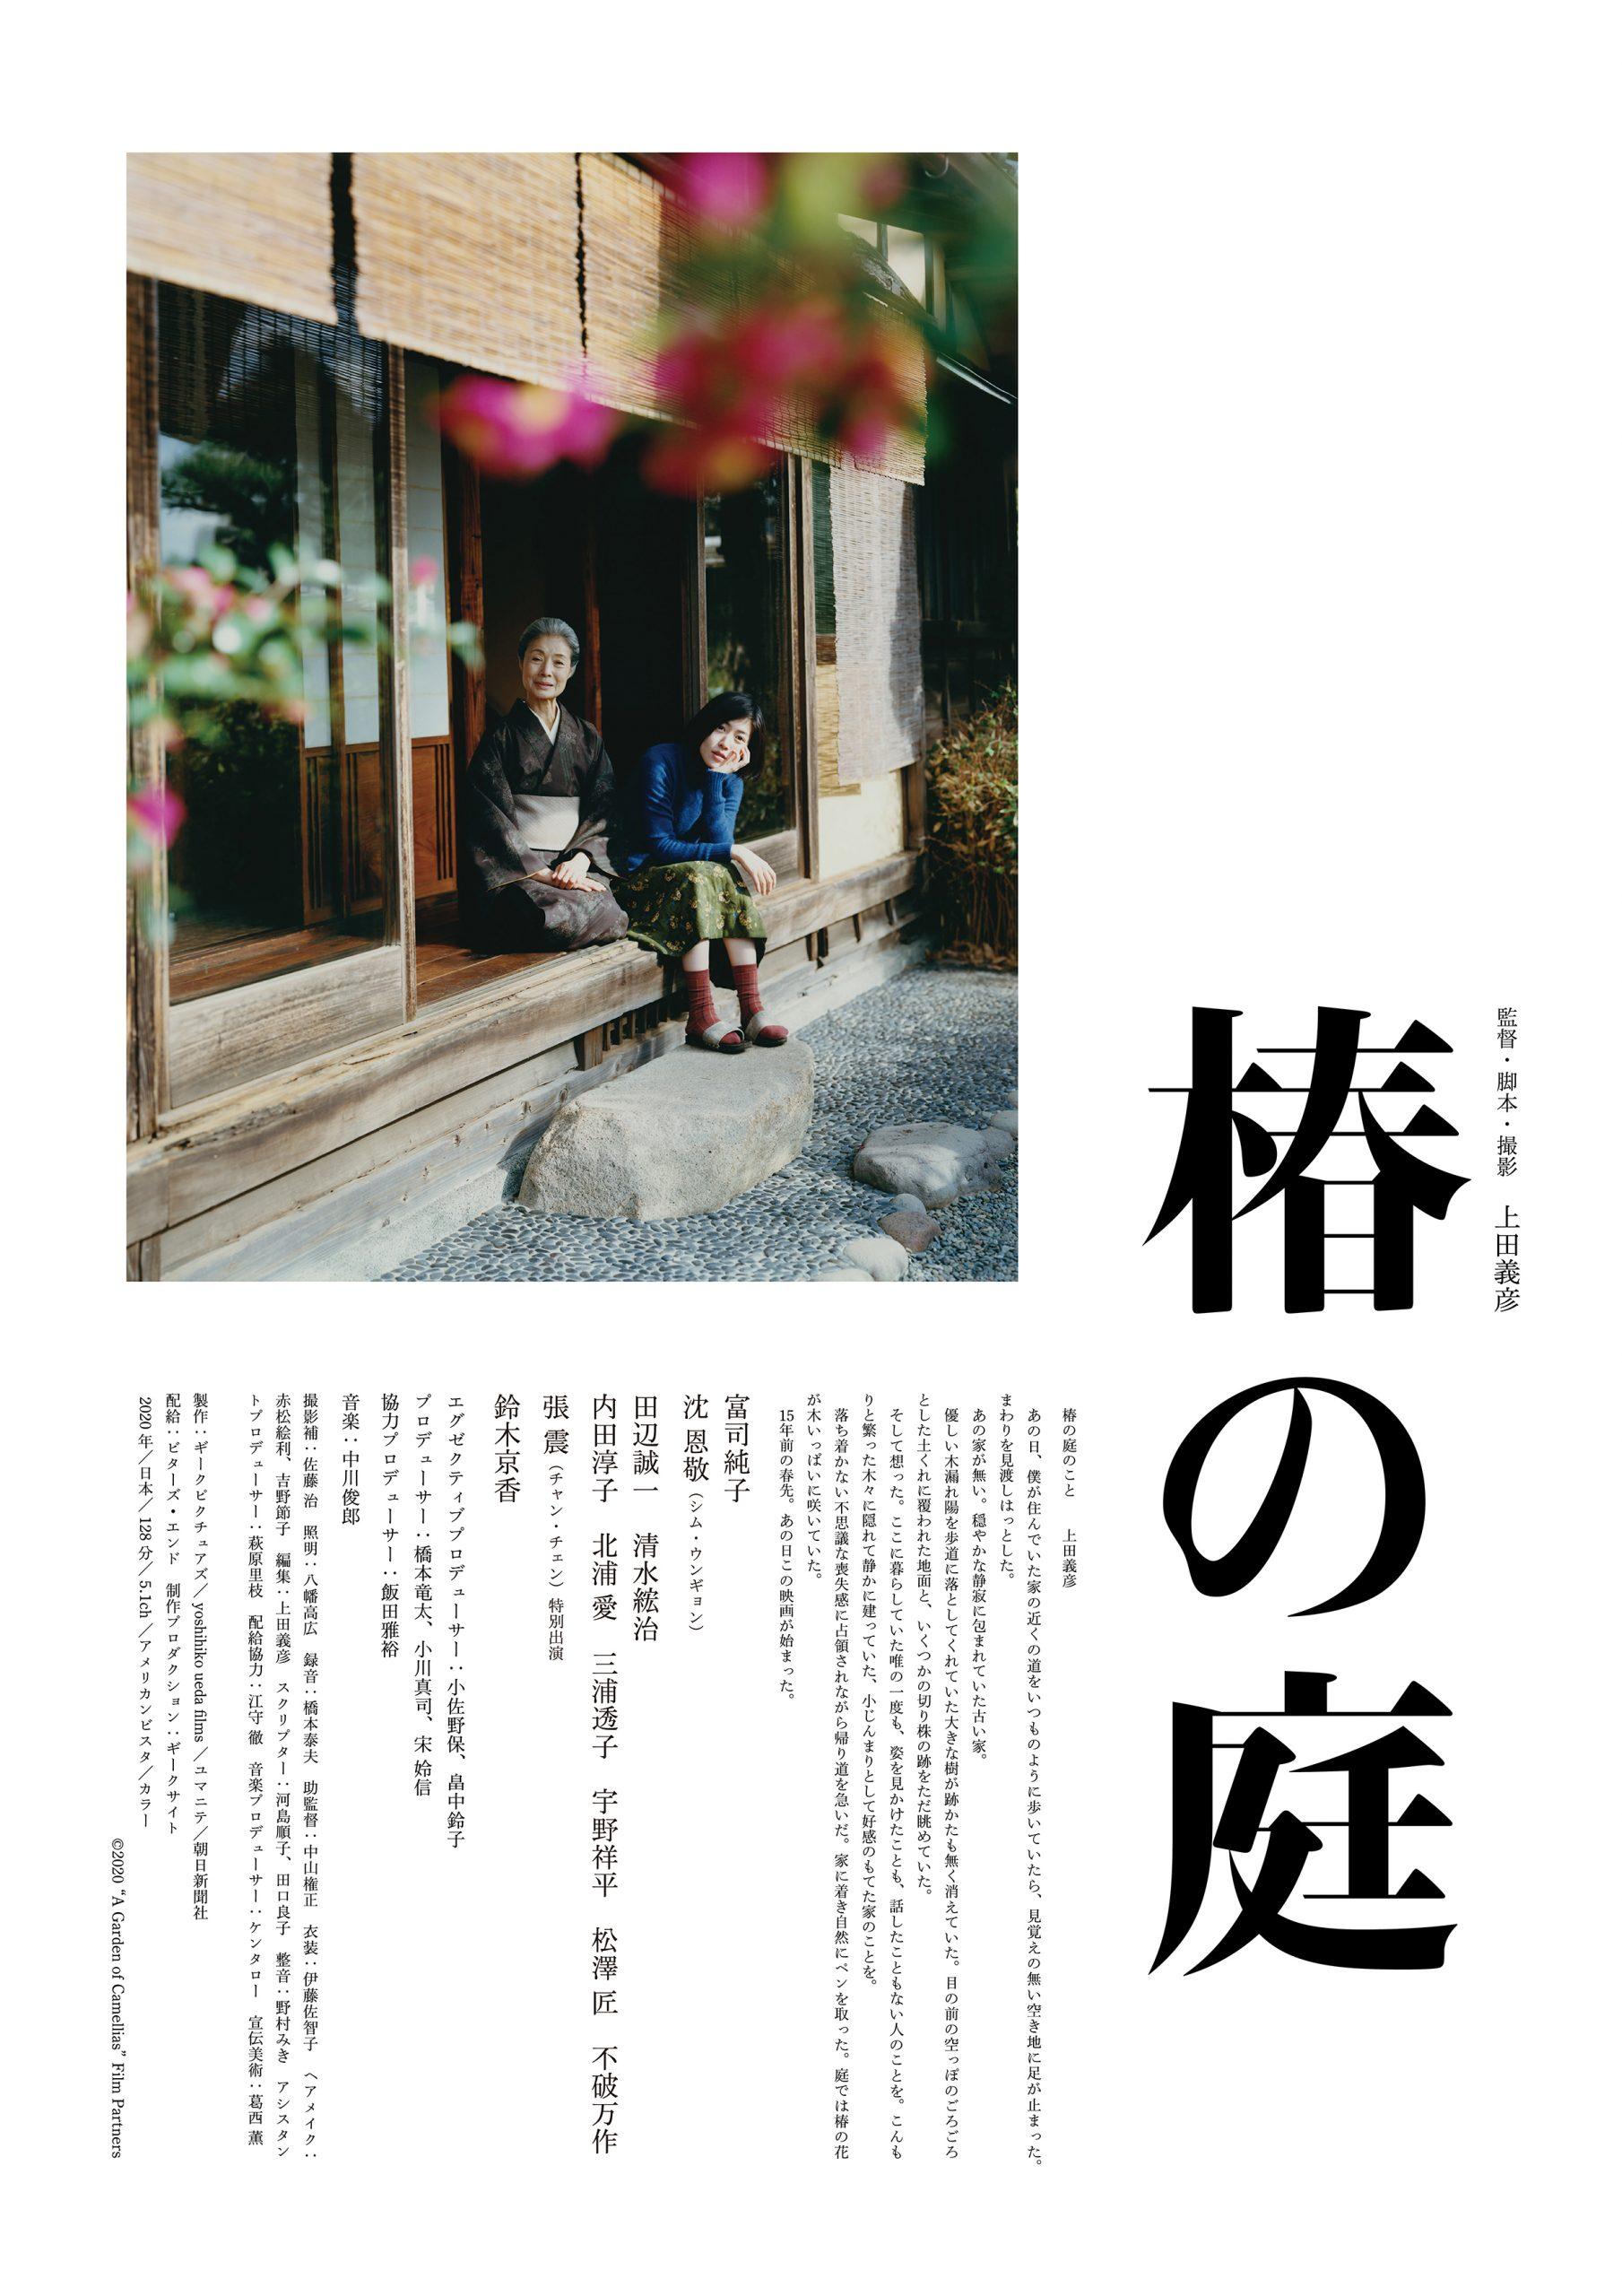 https://cineswitch.com/wp-content/uploads/2020/12/TSUBAKI_poster_1-scaled.jpg